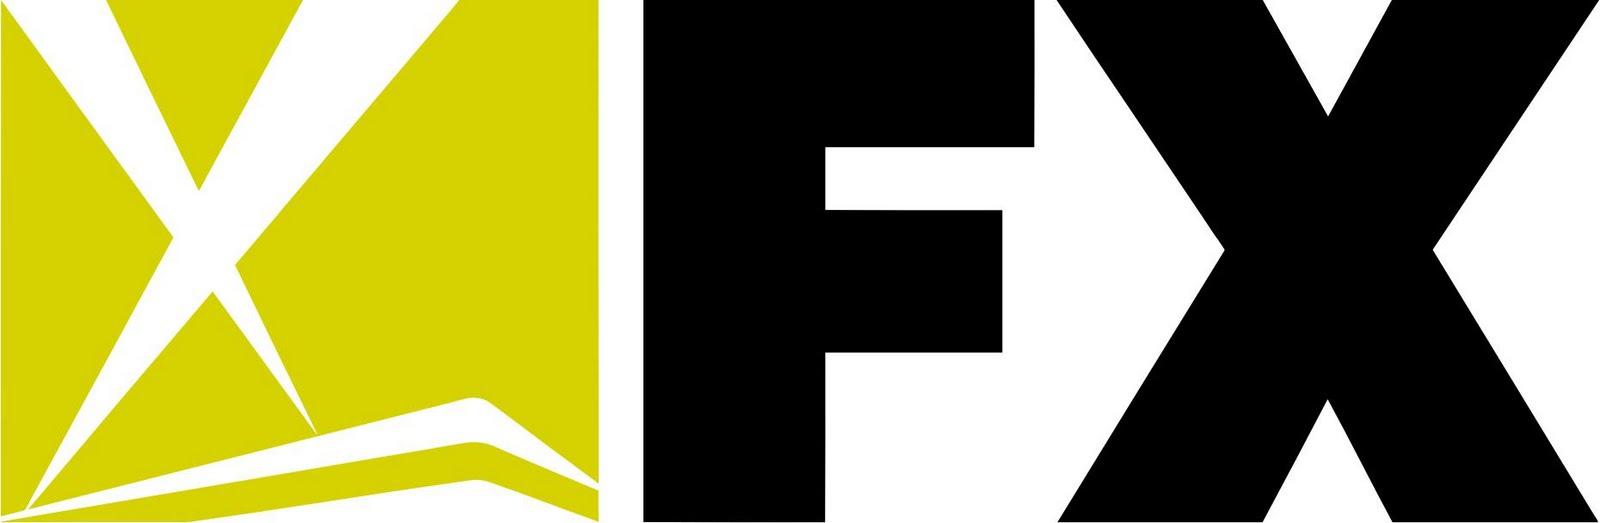 Forex news channel